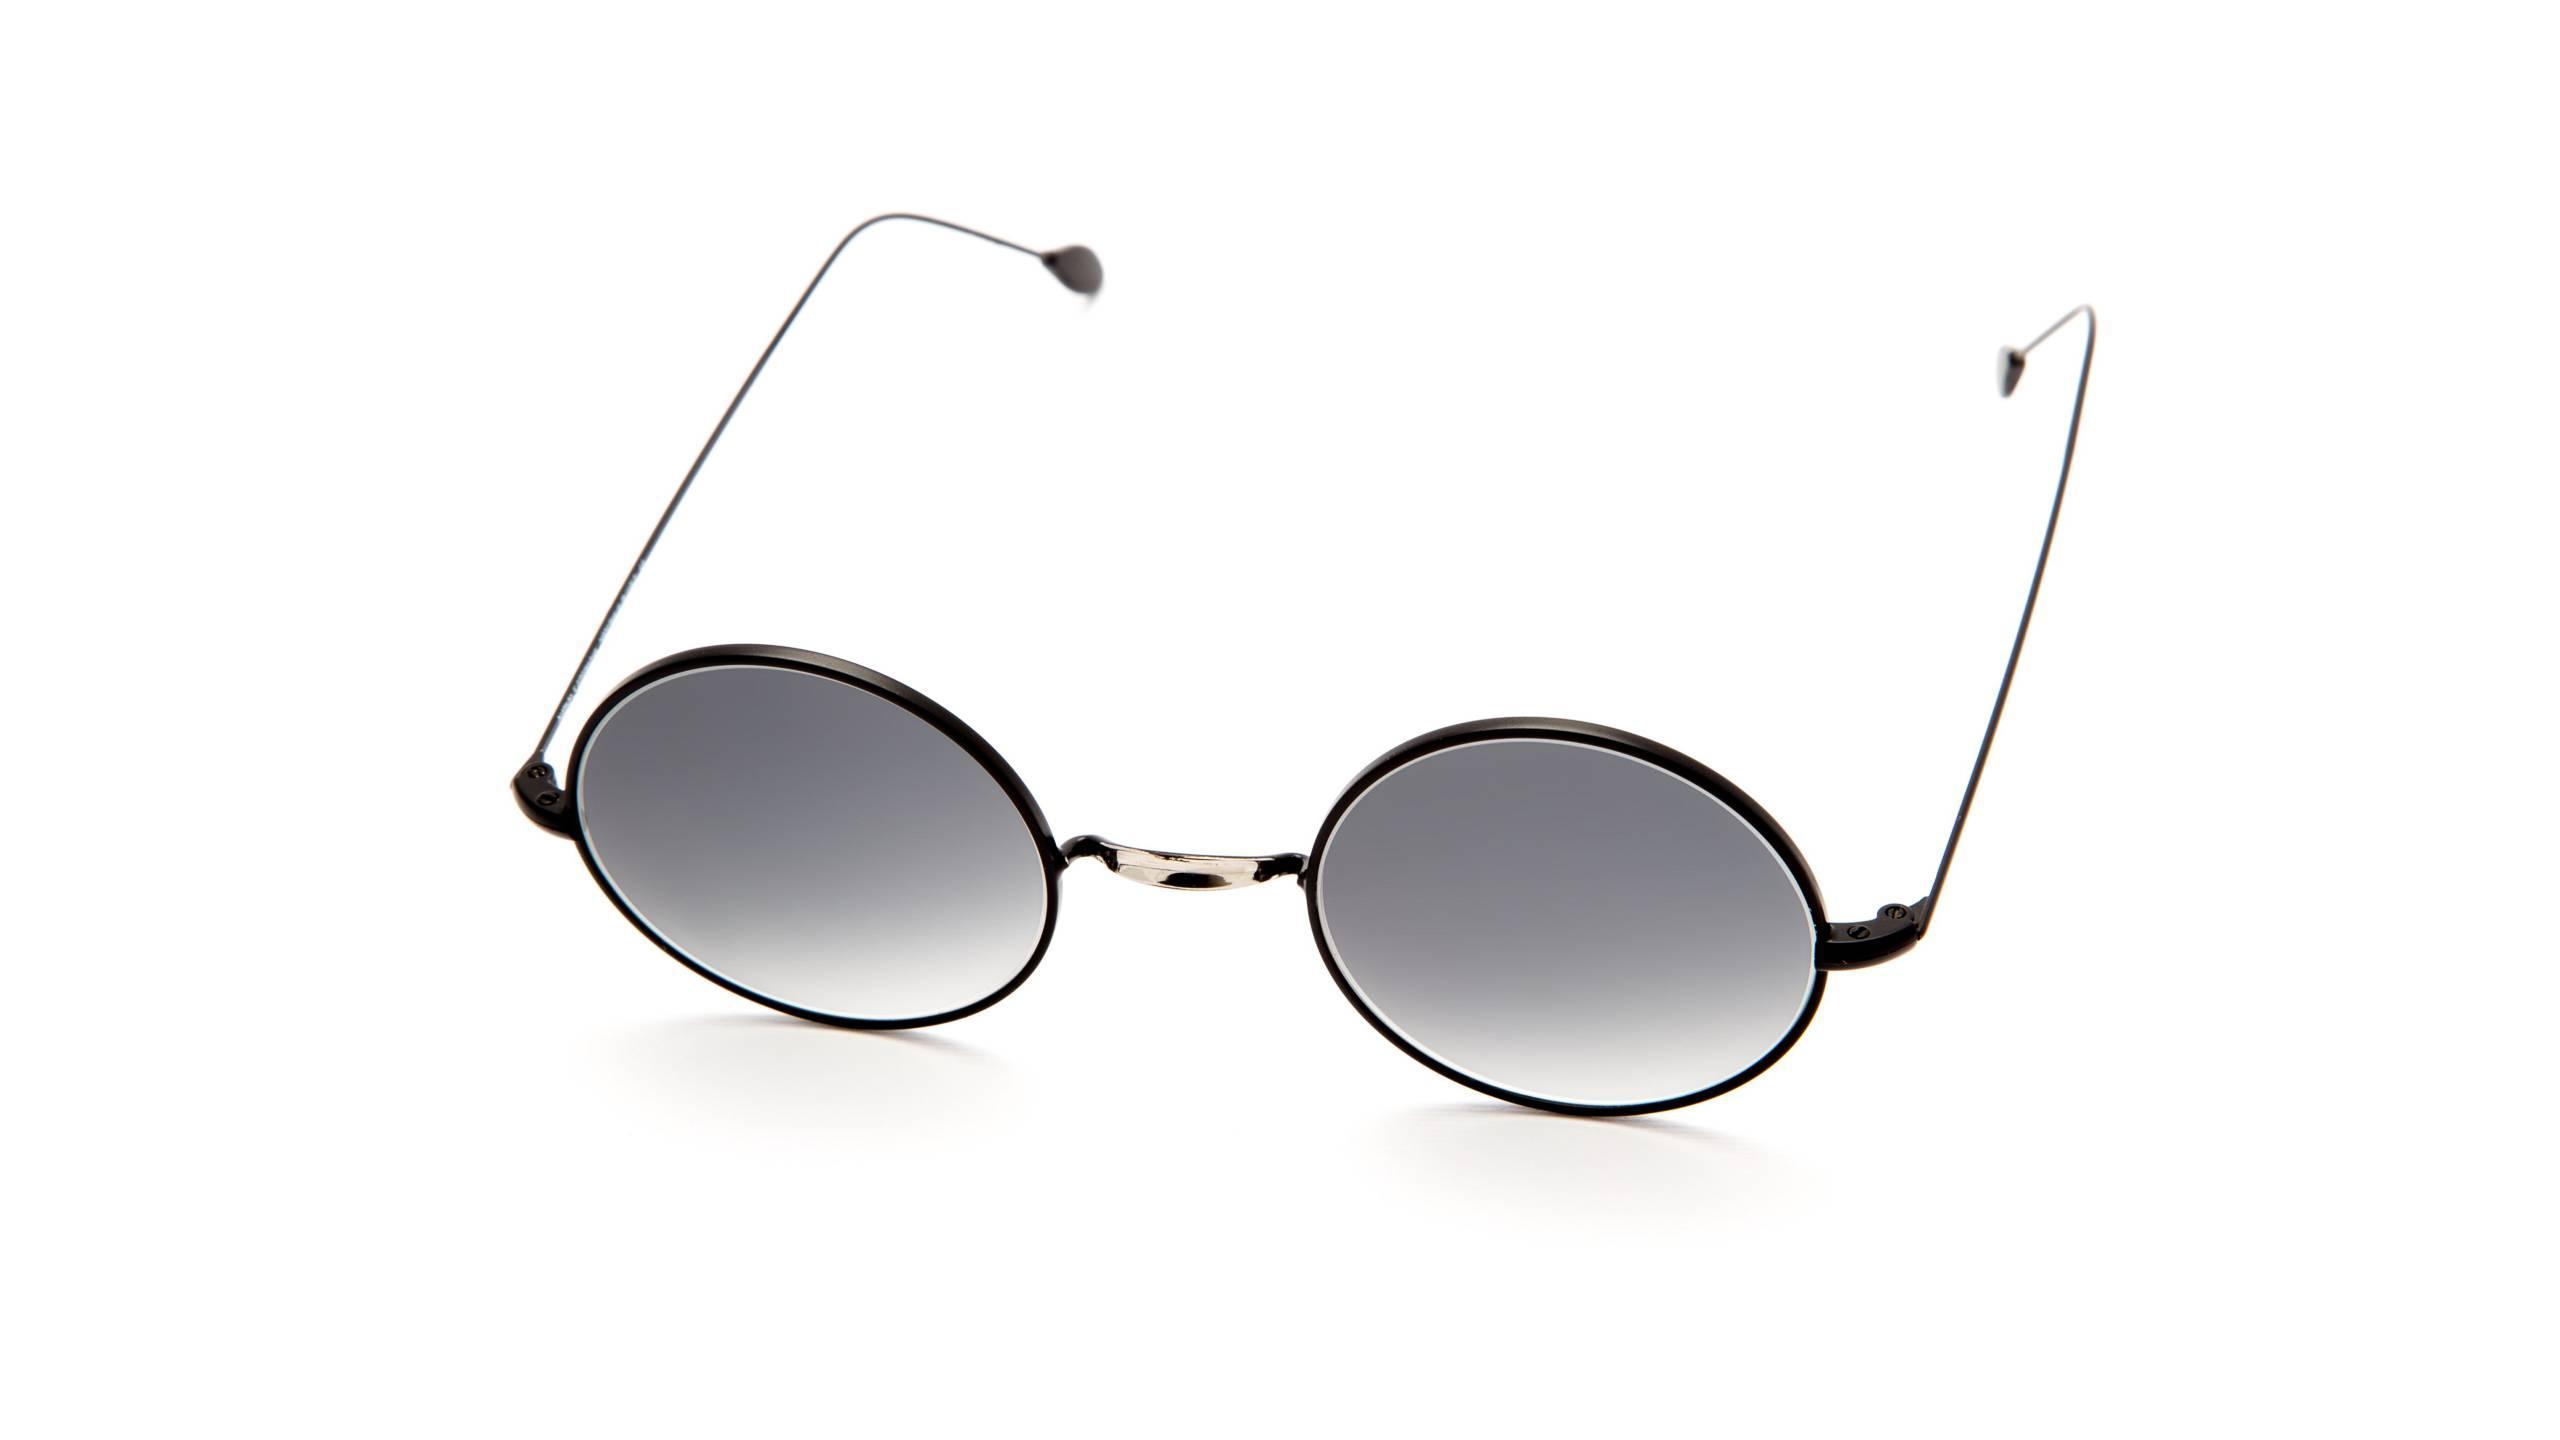 eyeglasses-Nathan-Kaltermann-made-in-Italy-ISCHIA-NERO-UNISEX-SOLE2